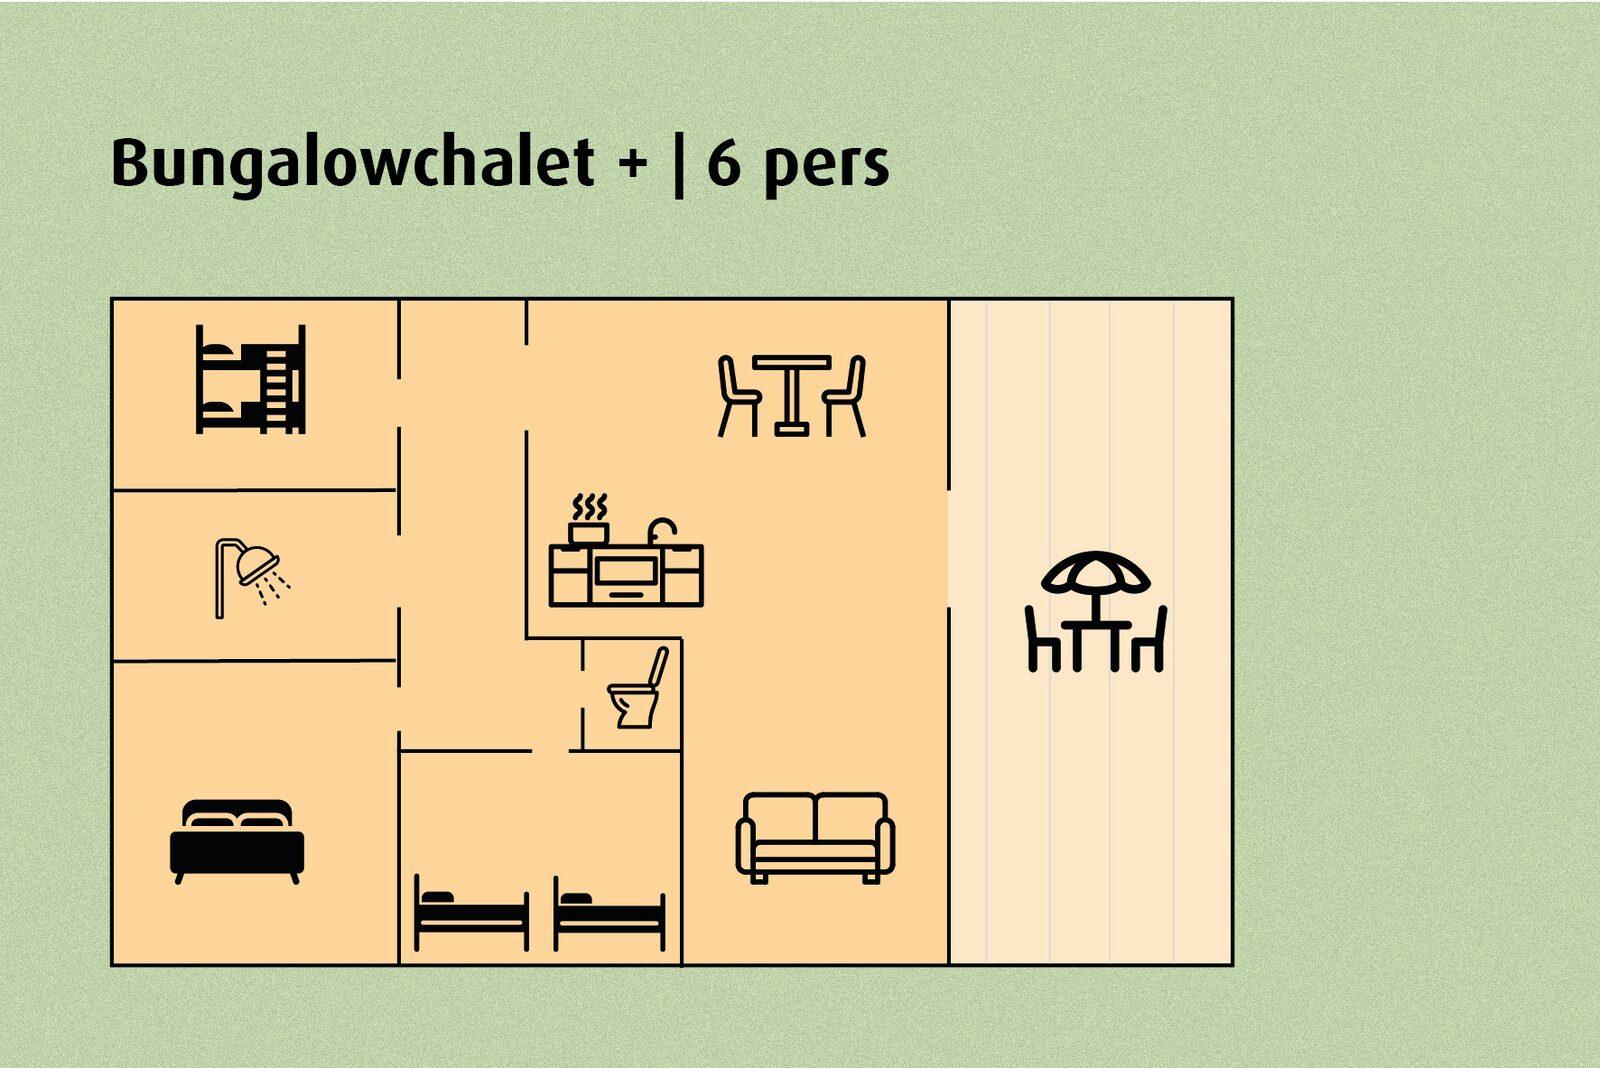 Bungalow Chalet+ | 6 people